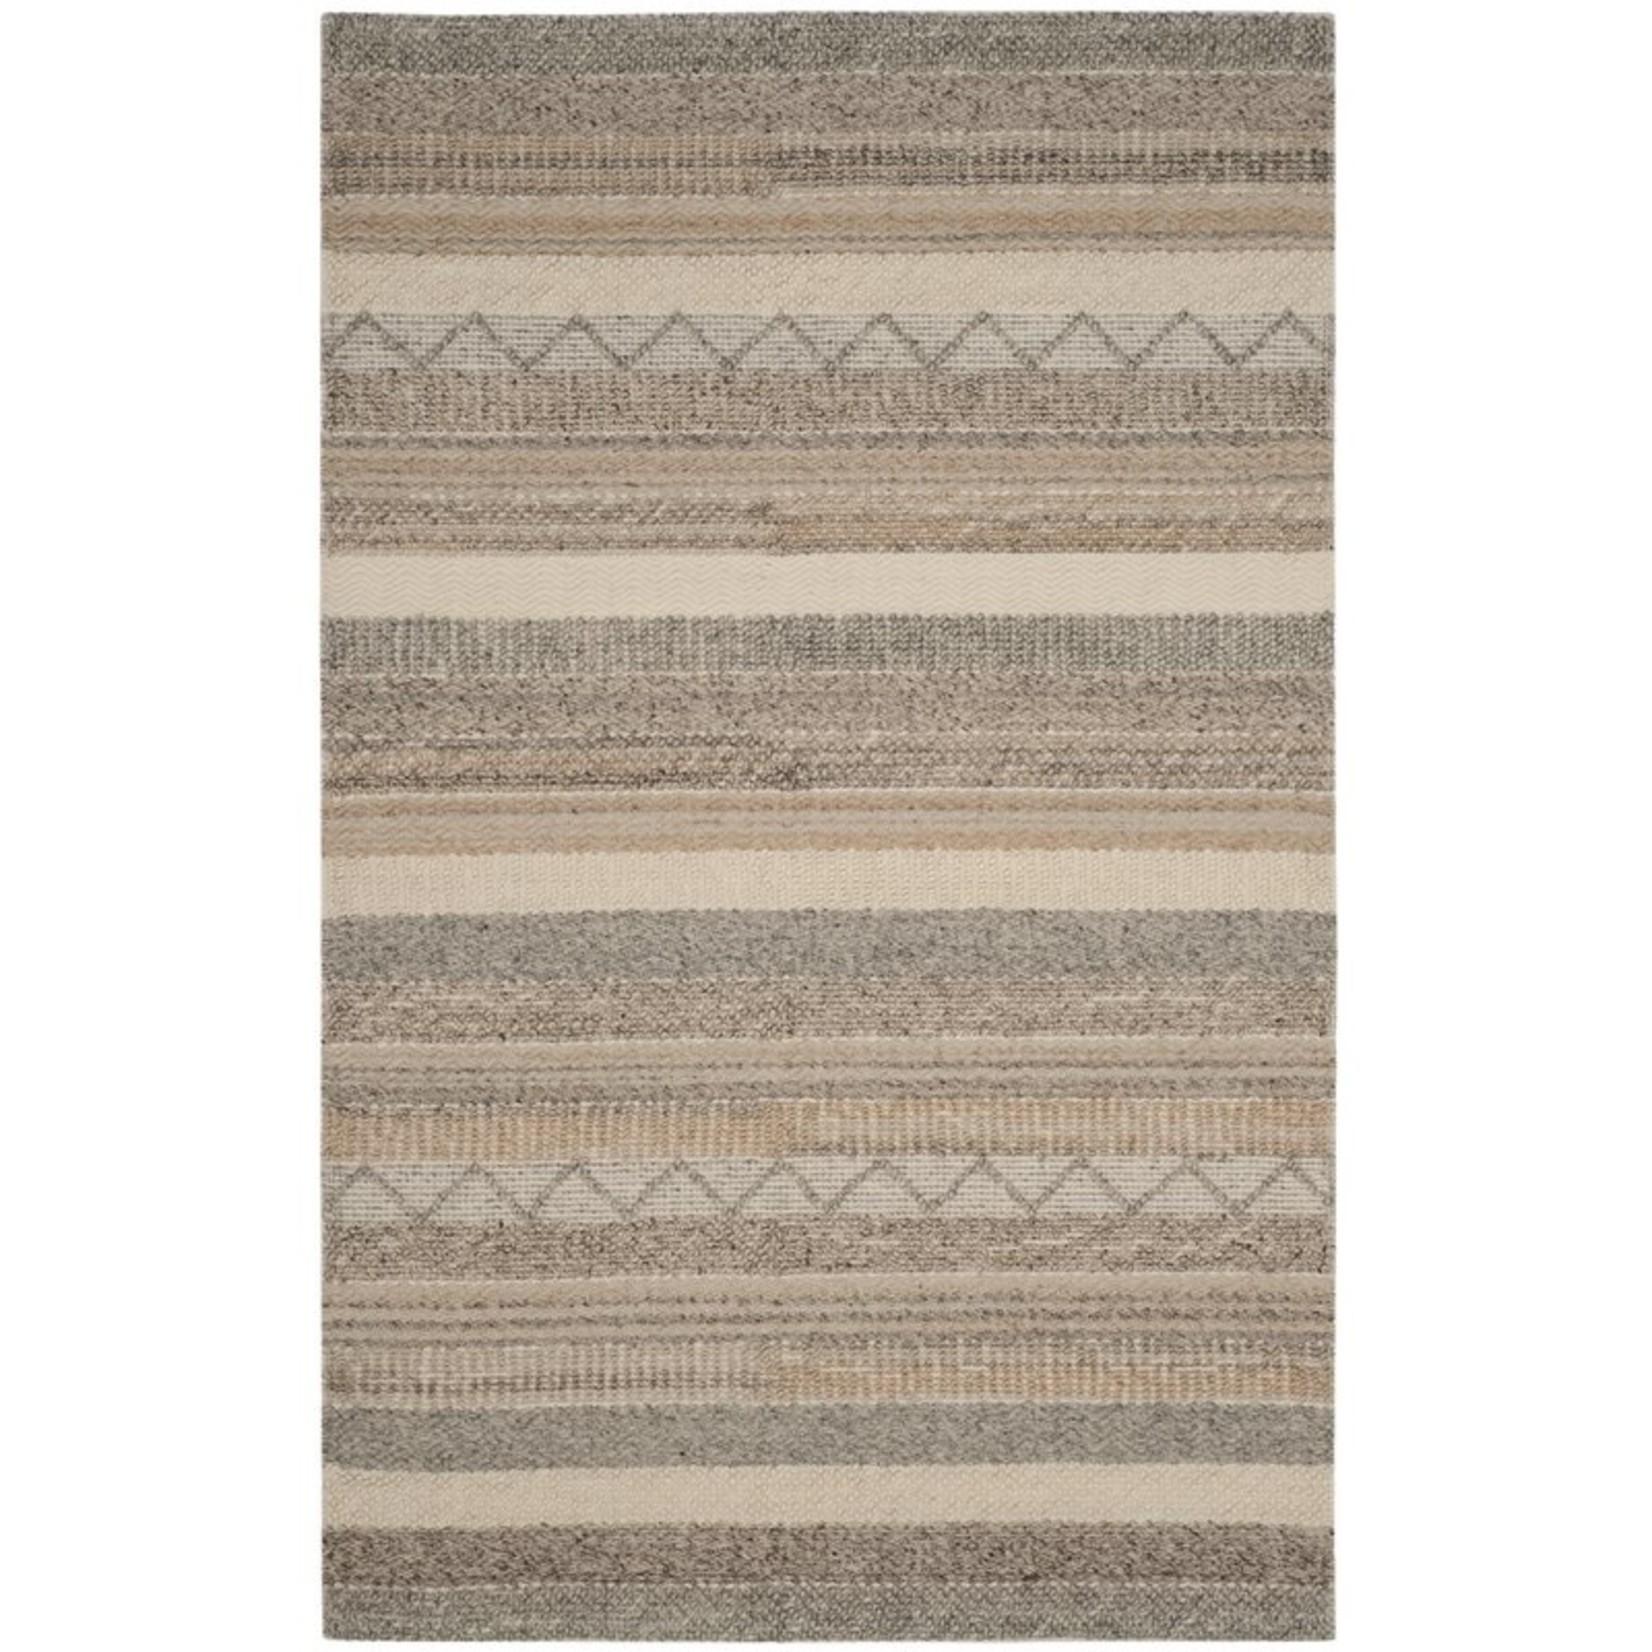 *3' x 5 -  Gifford Handmade Flatweave Beige/Ivory/Light Salmon Rug